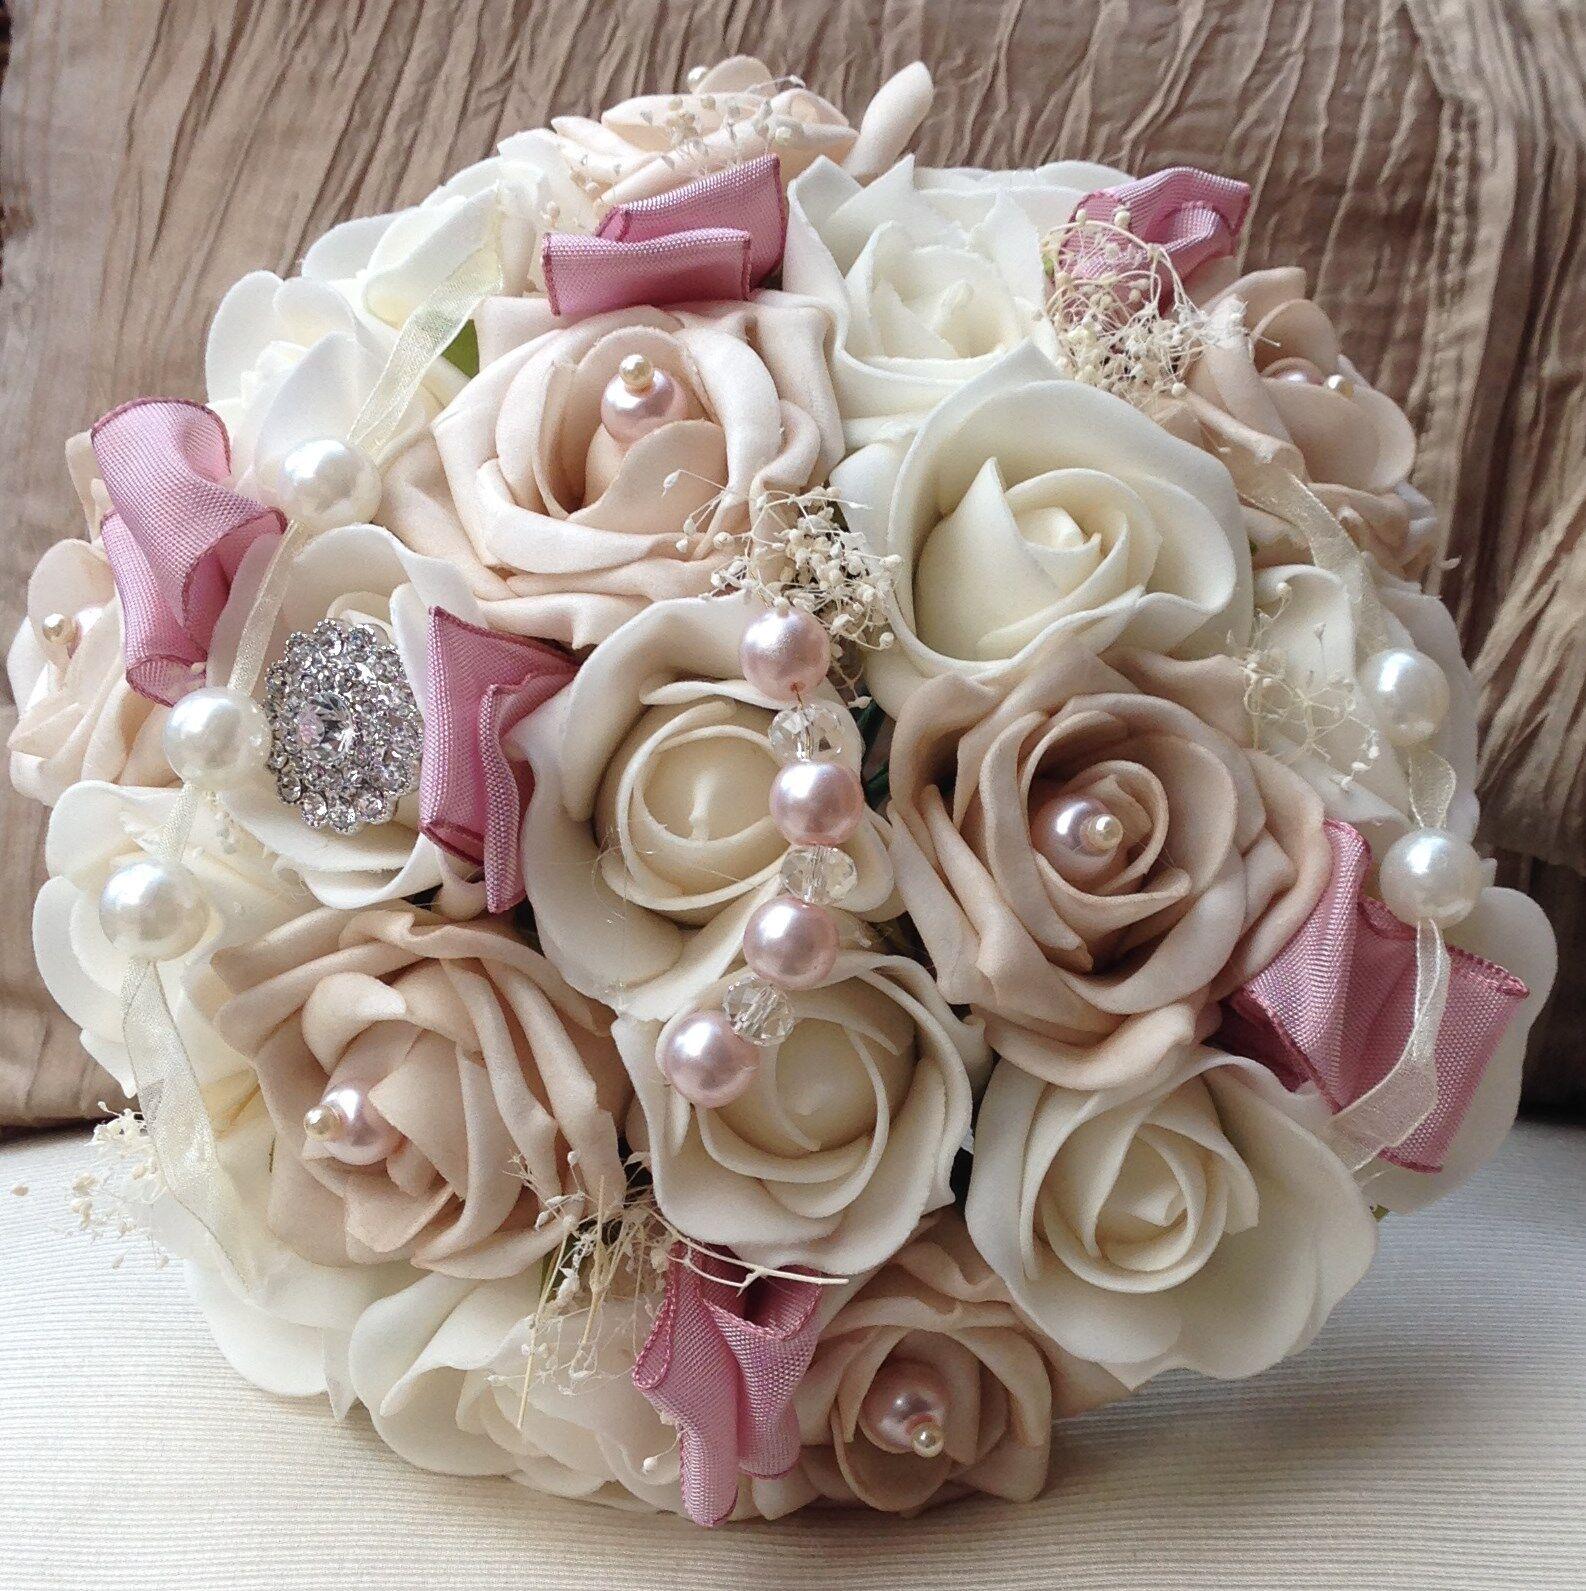 Wedding Flowers Ebay: DUSKY BLUSH VINTAGE PINK IVORY BROOCH ROSES BRIDES BOUQUET